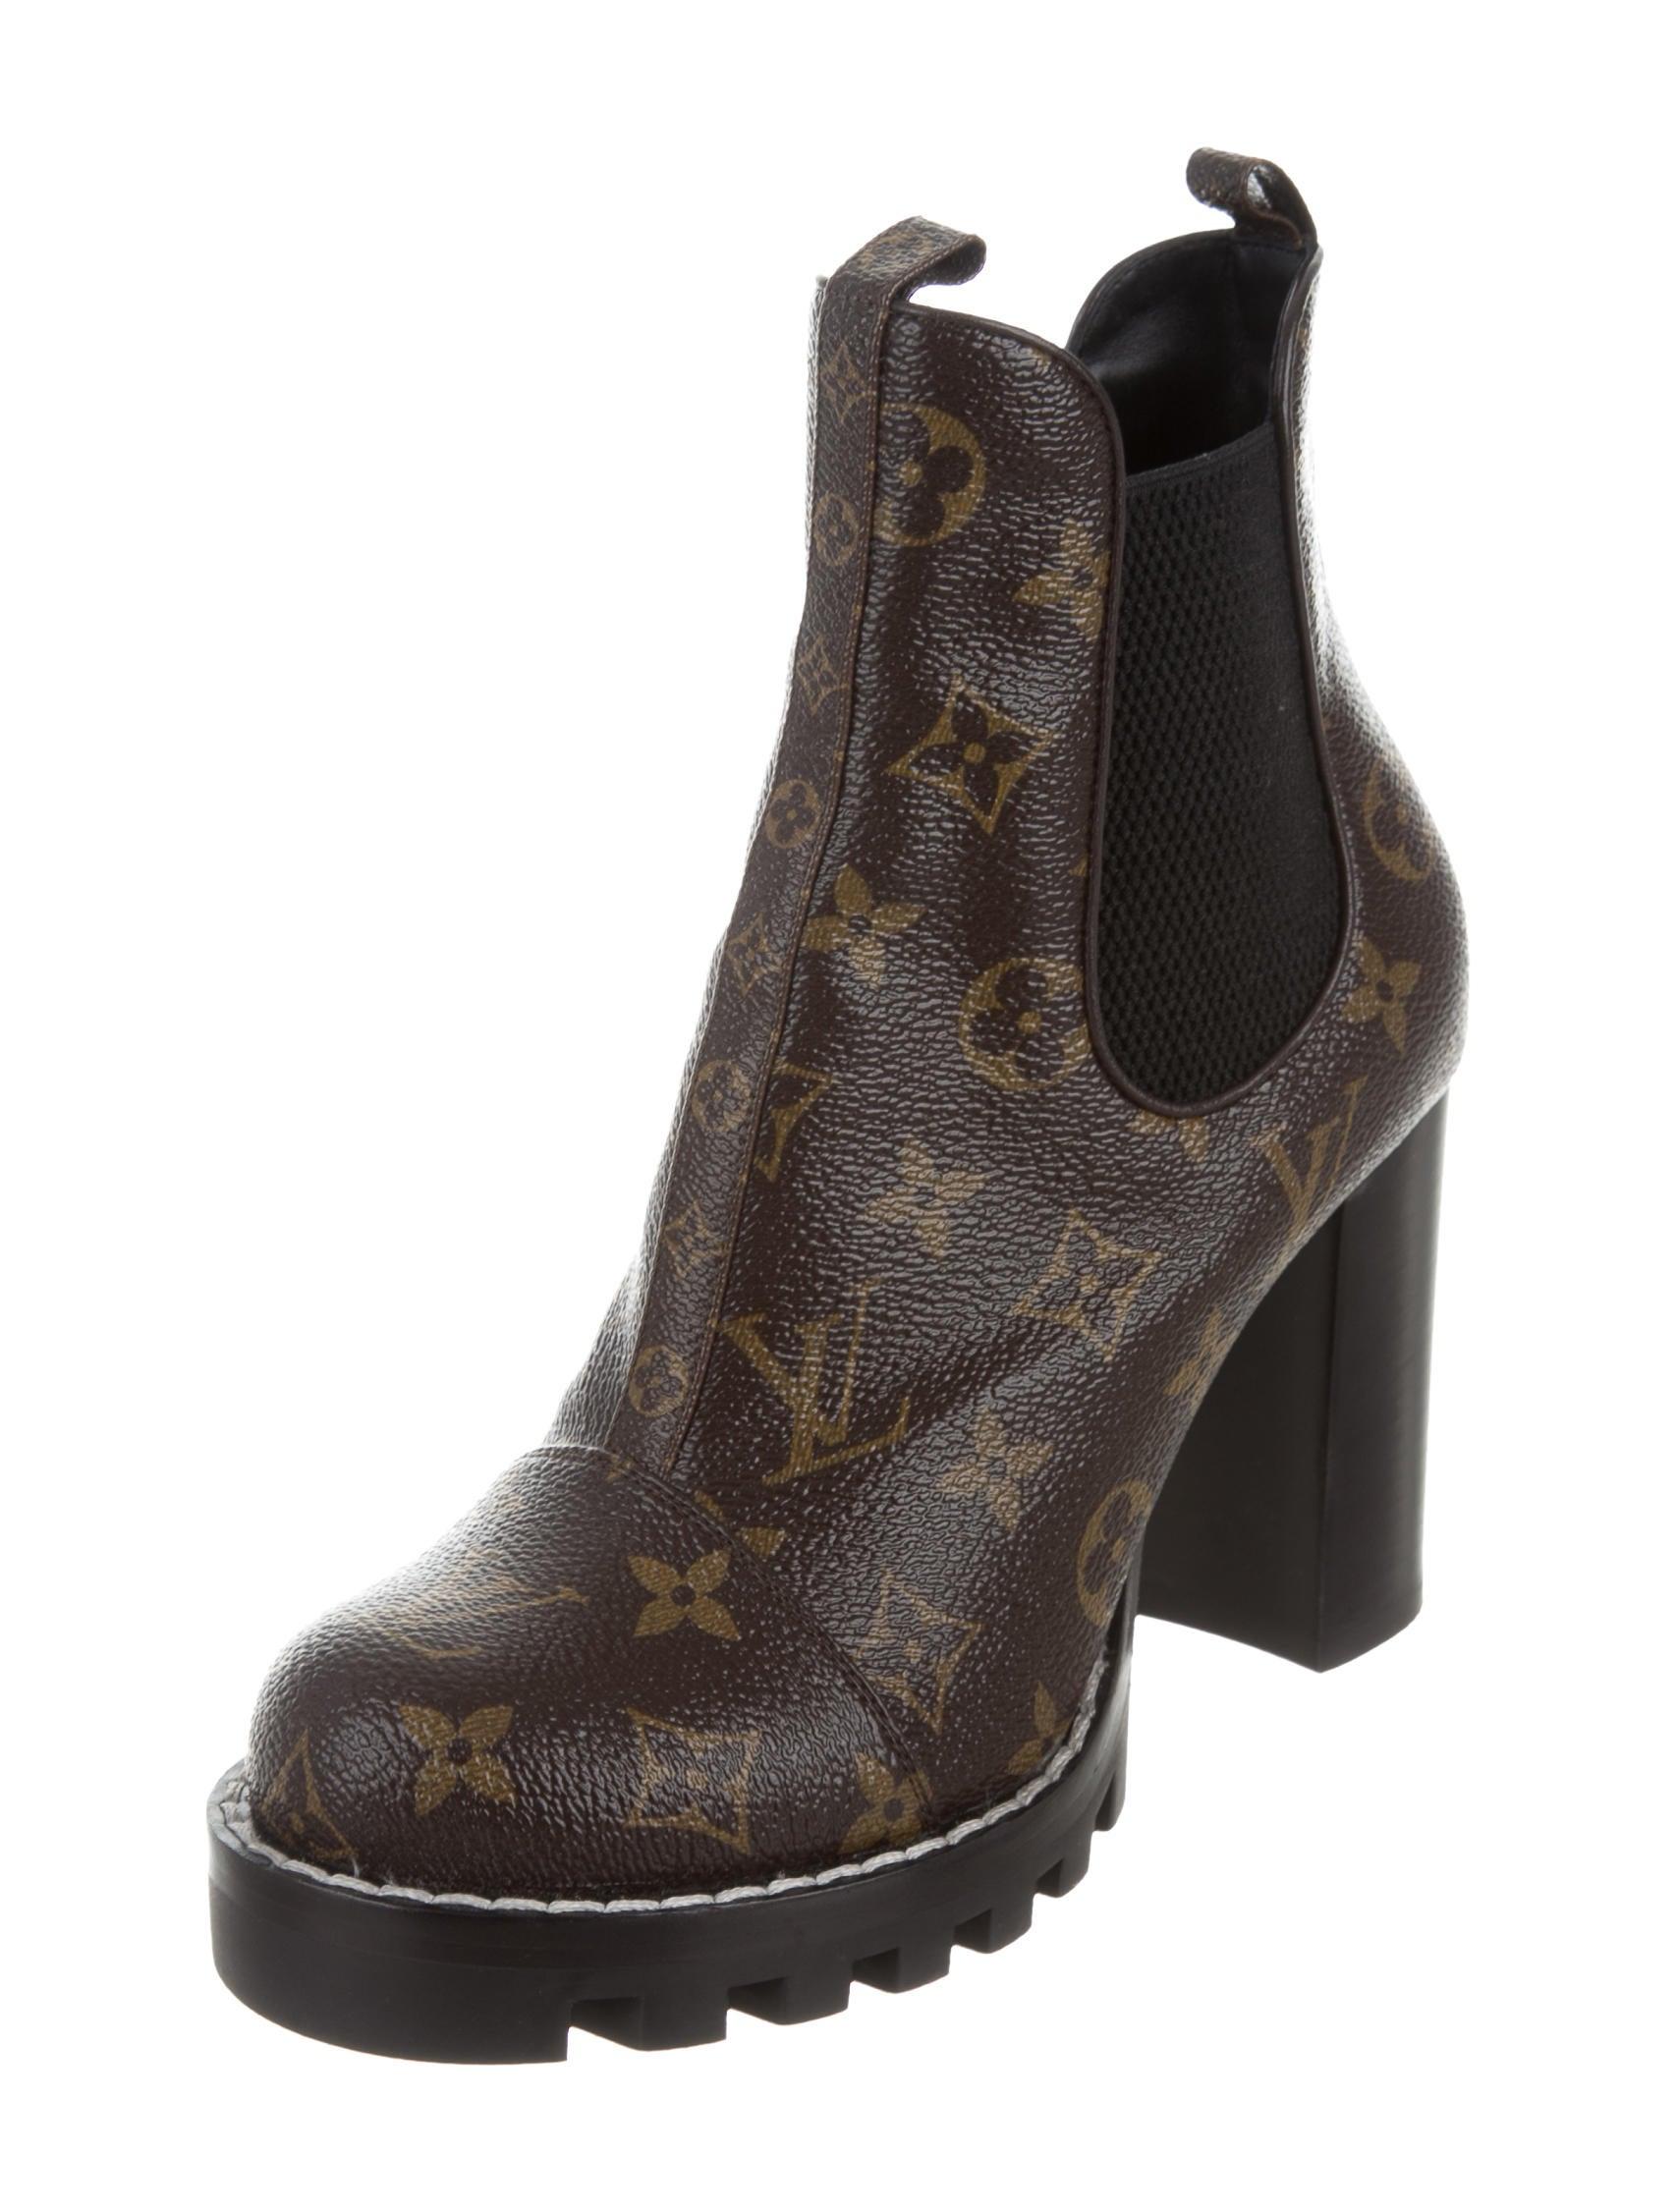 louis vuitton ankle boots. star trail ankle boots louis vuitton